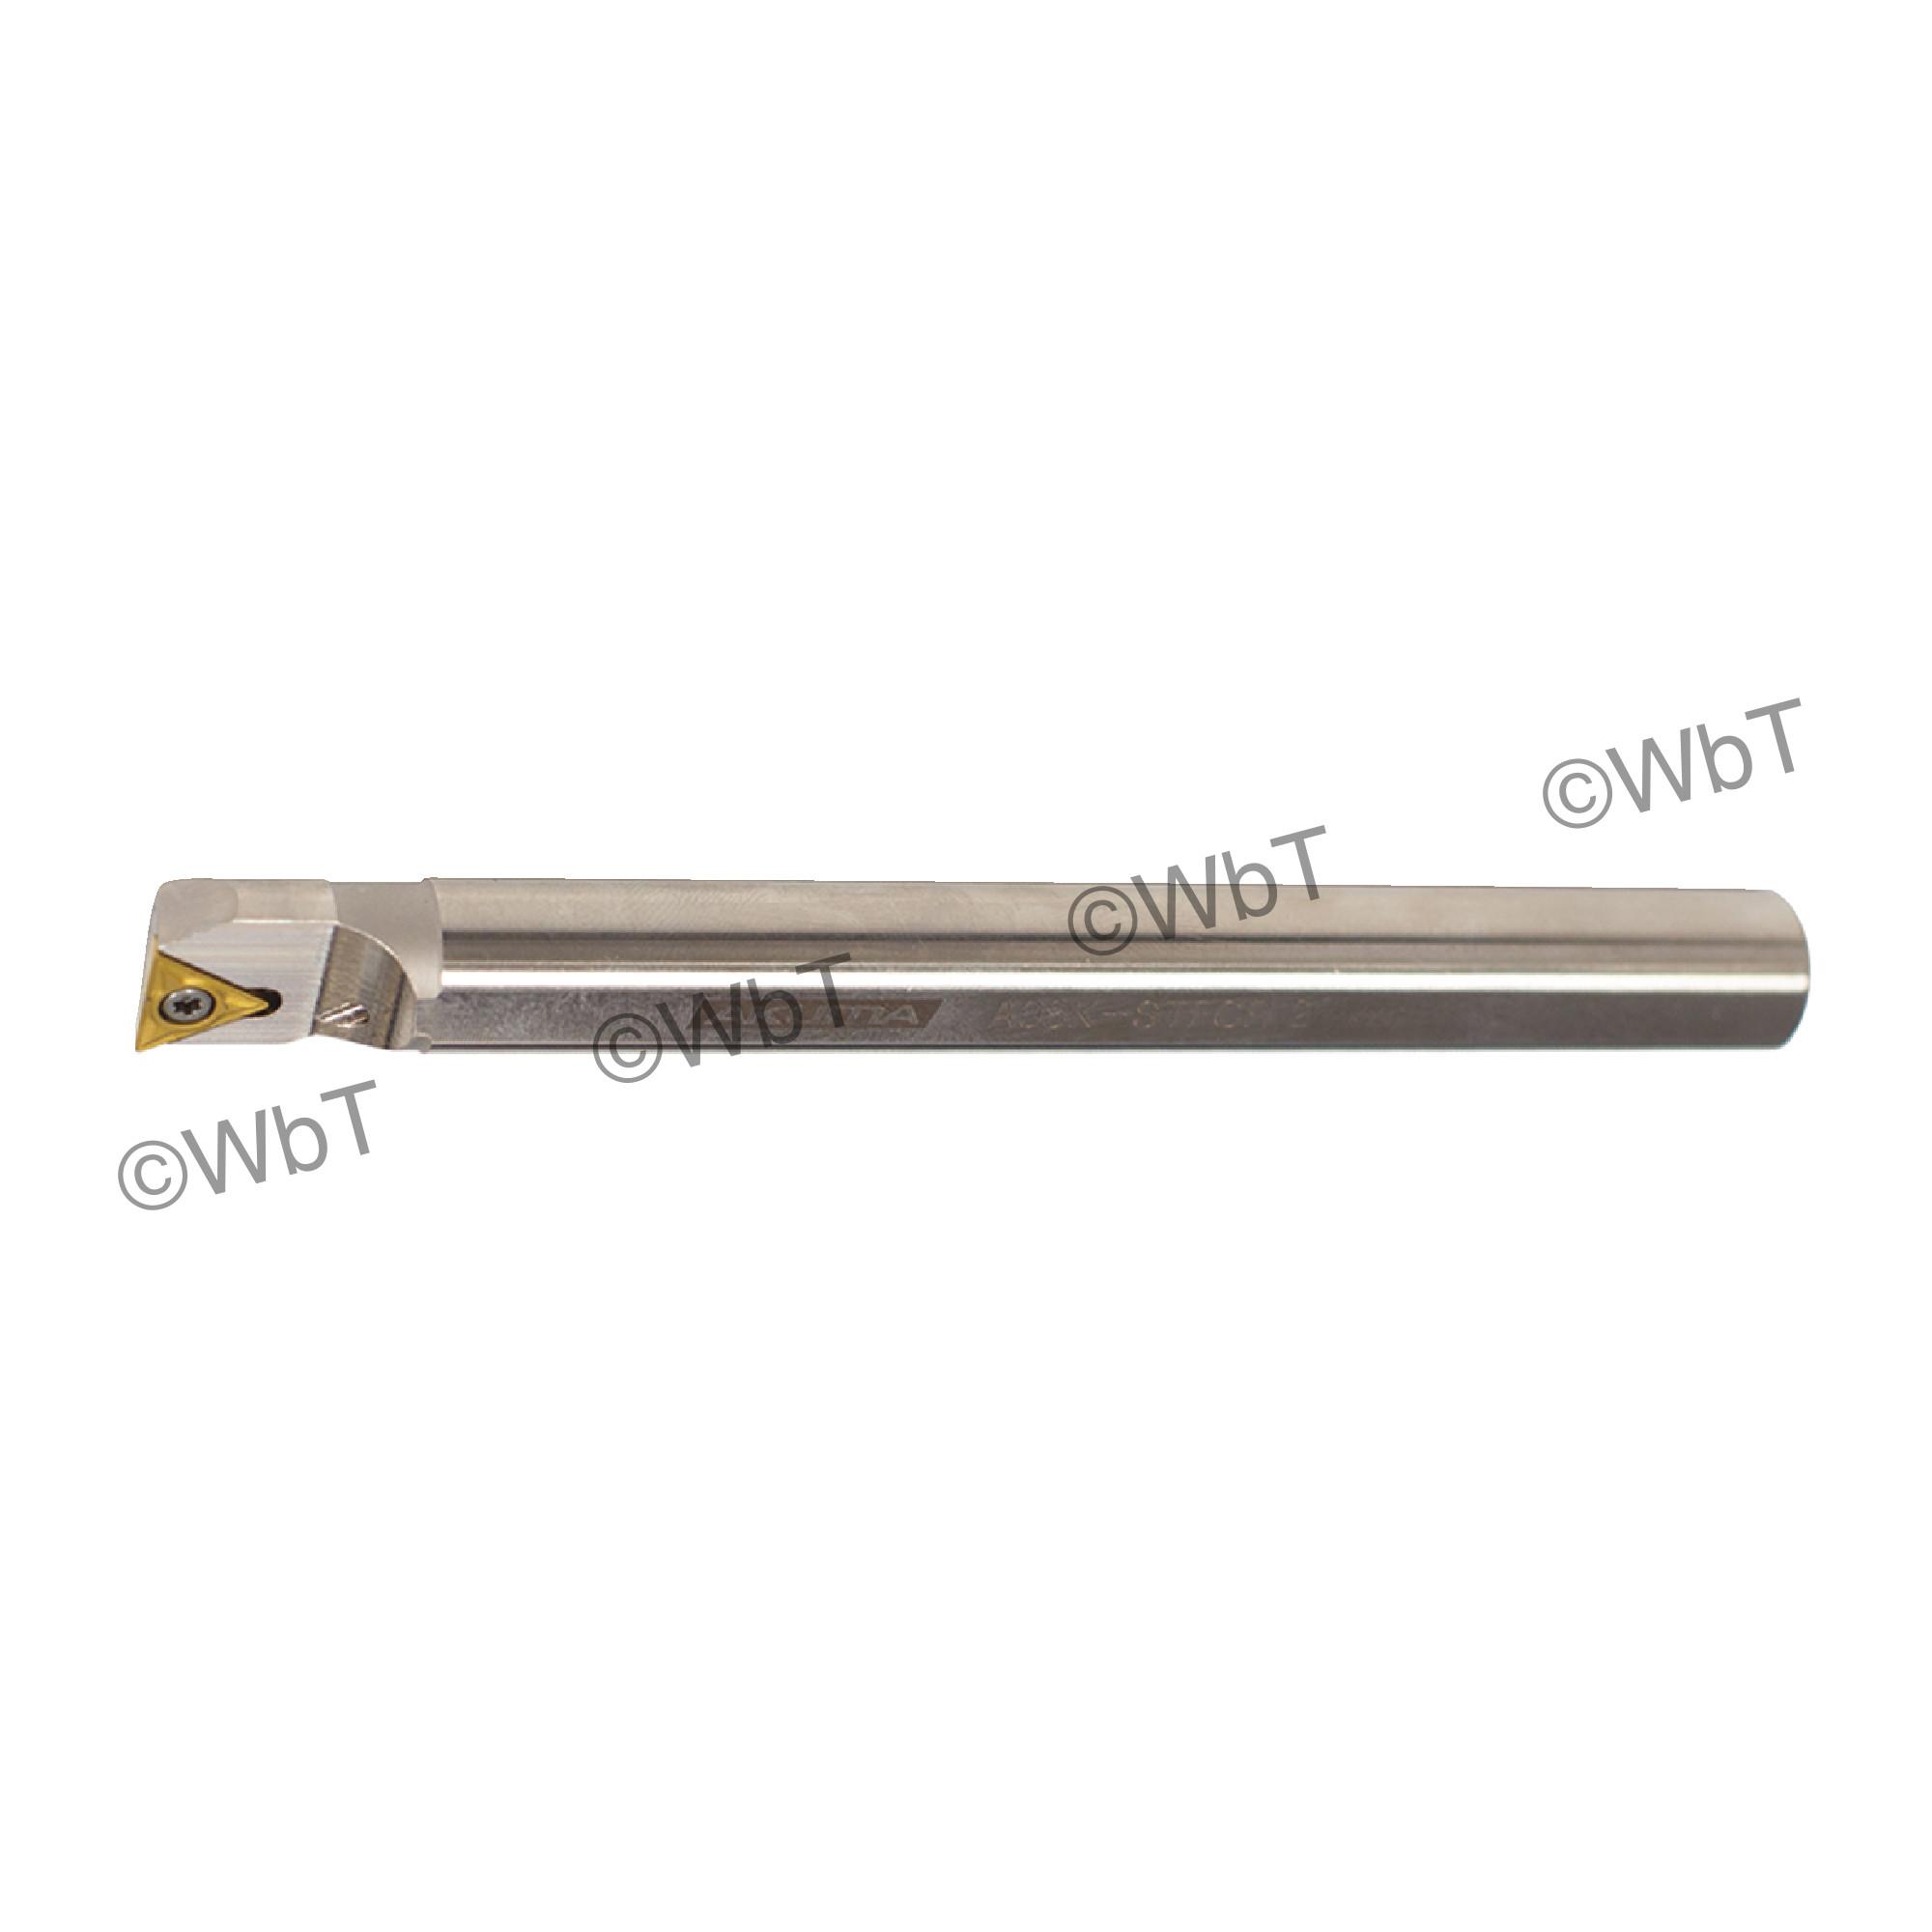 "AKUMA - A08K-STFCR-2 / Steel Boring Bar / 1/2"" Shank / TCMT2(1.5)_ / Cooalnt Thru / Right Hand"